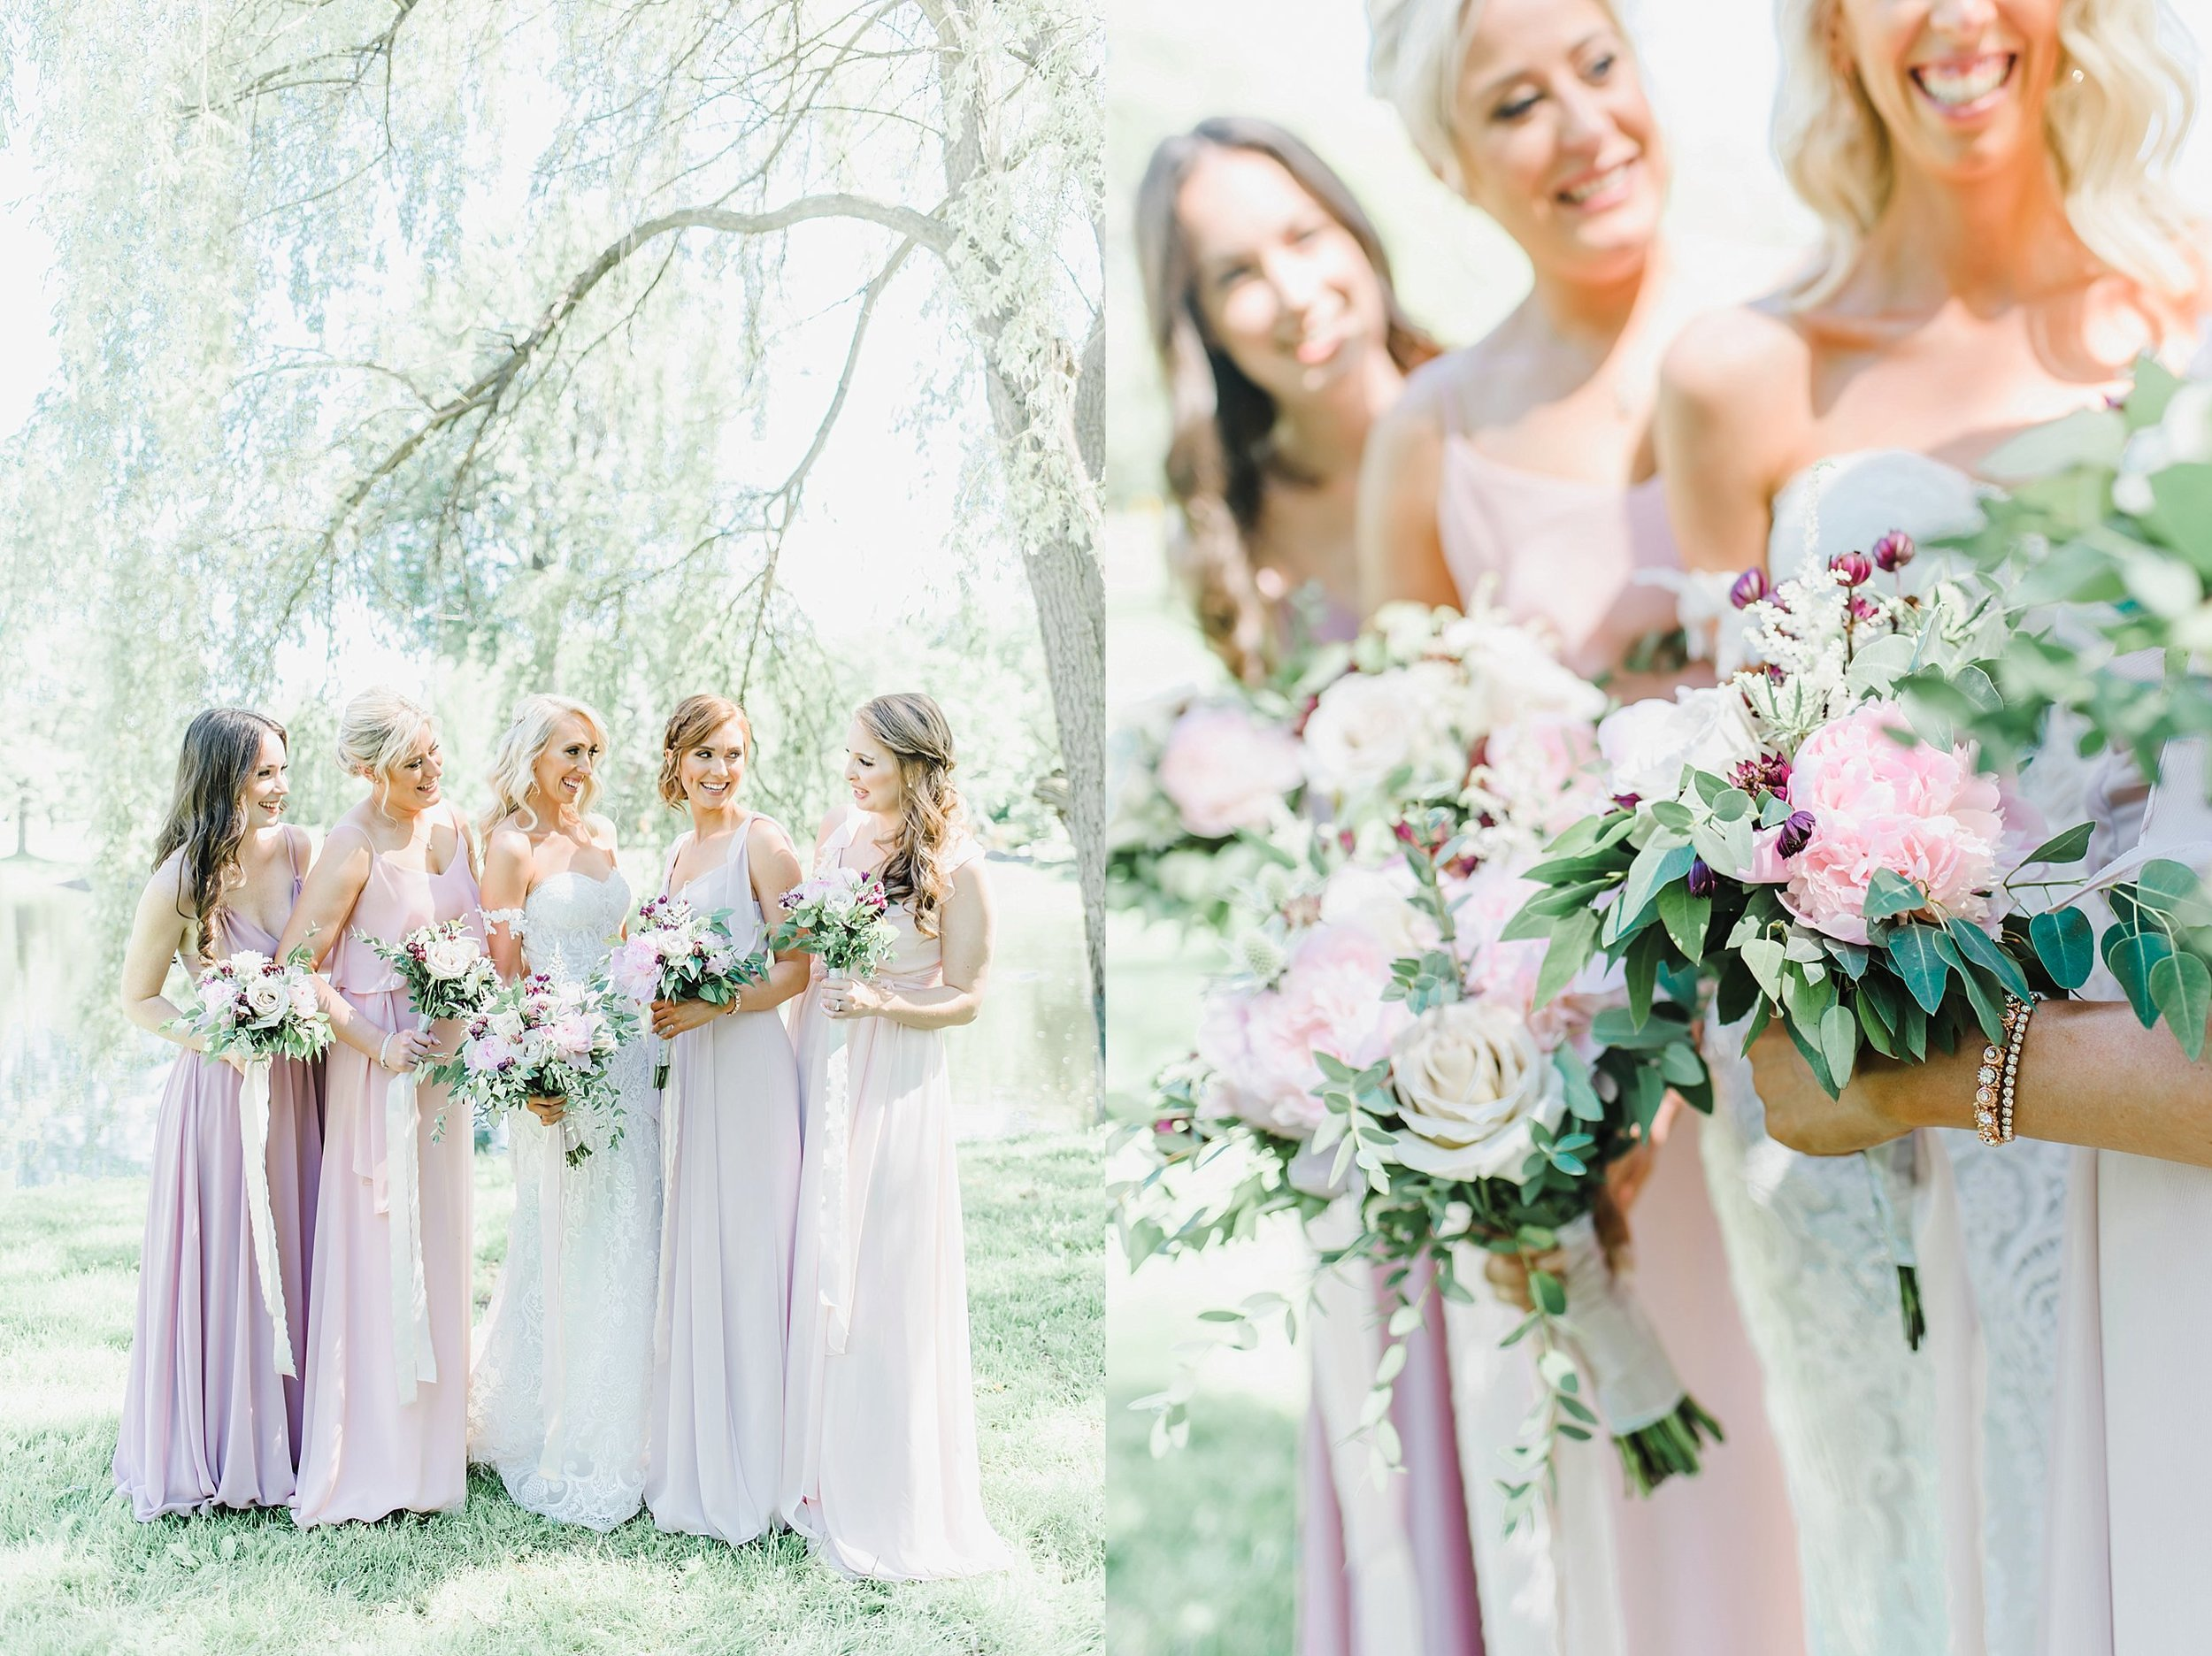 light airy indie fine art ottawa wedding photographer | Ali and Batoul Photography_0055.jpg